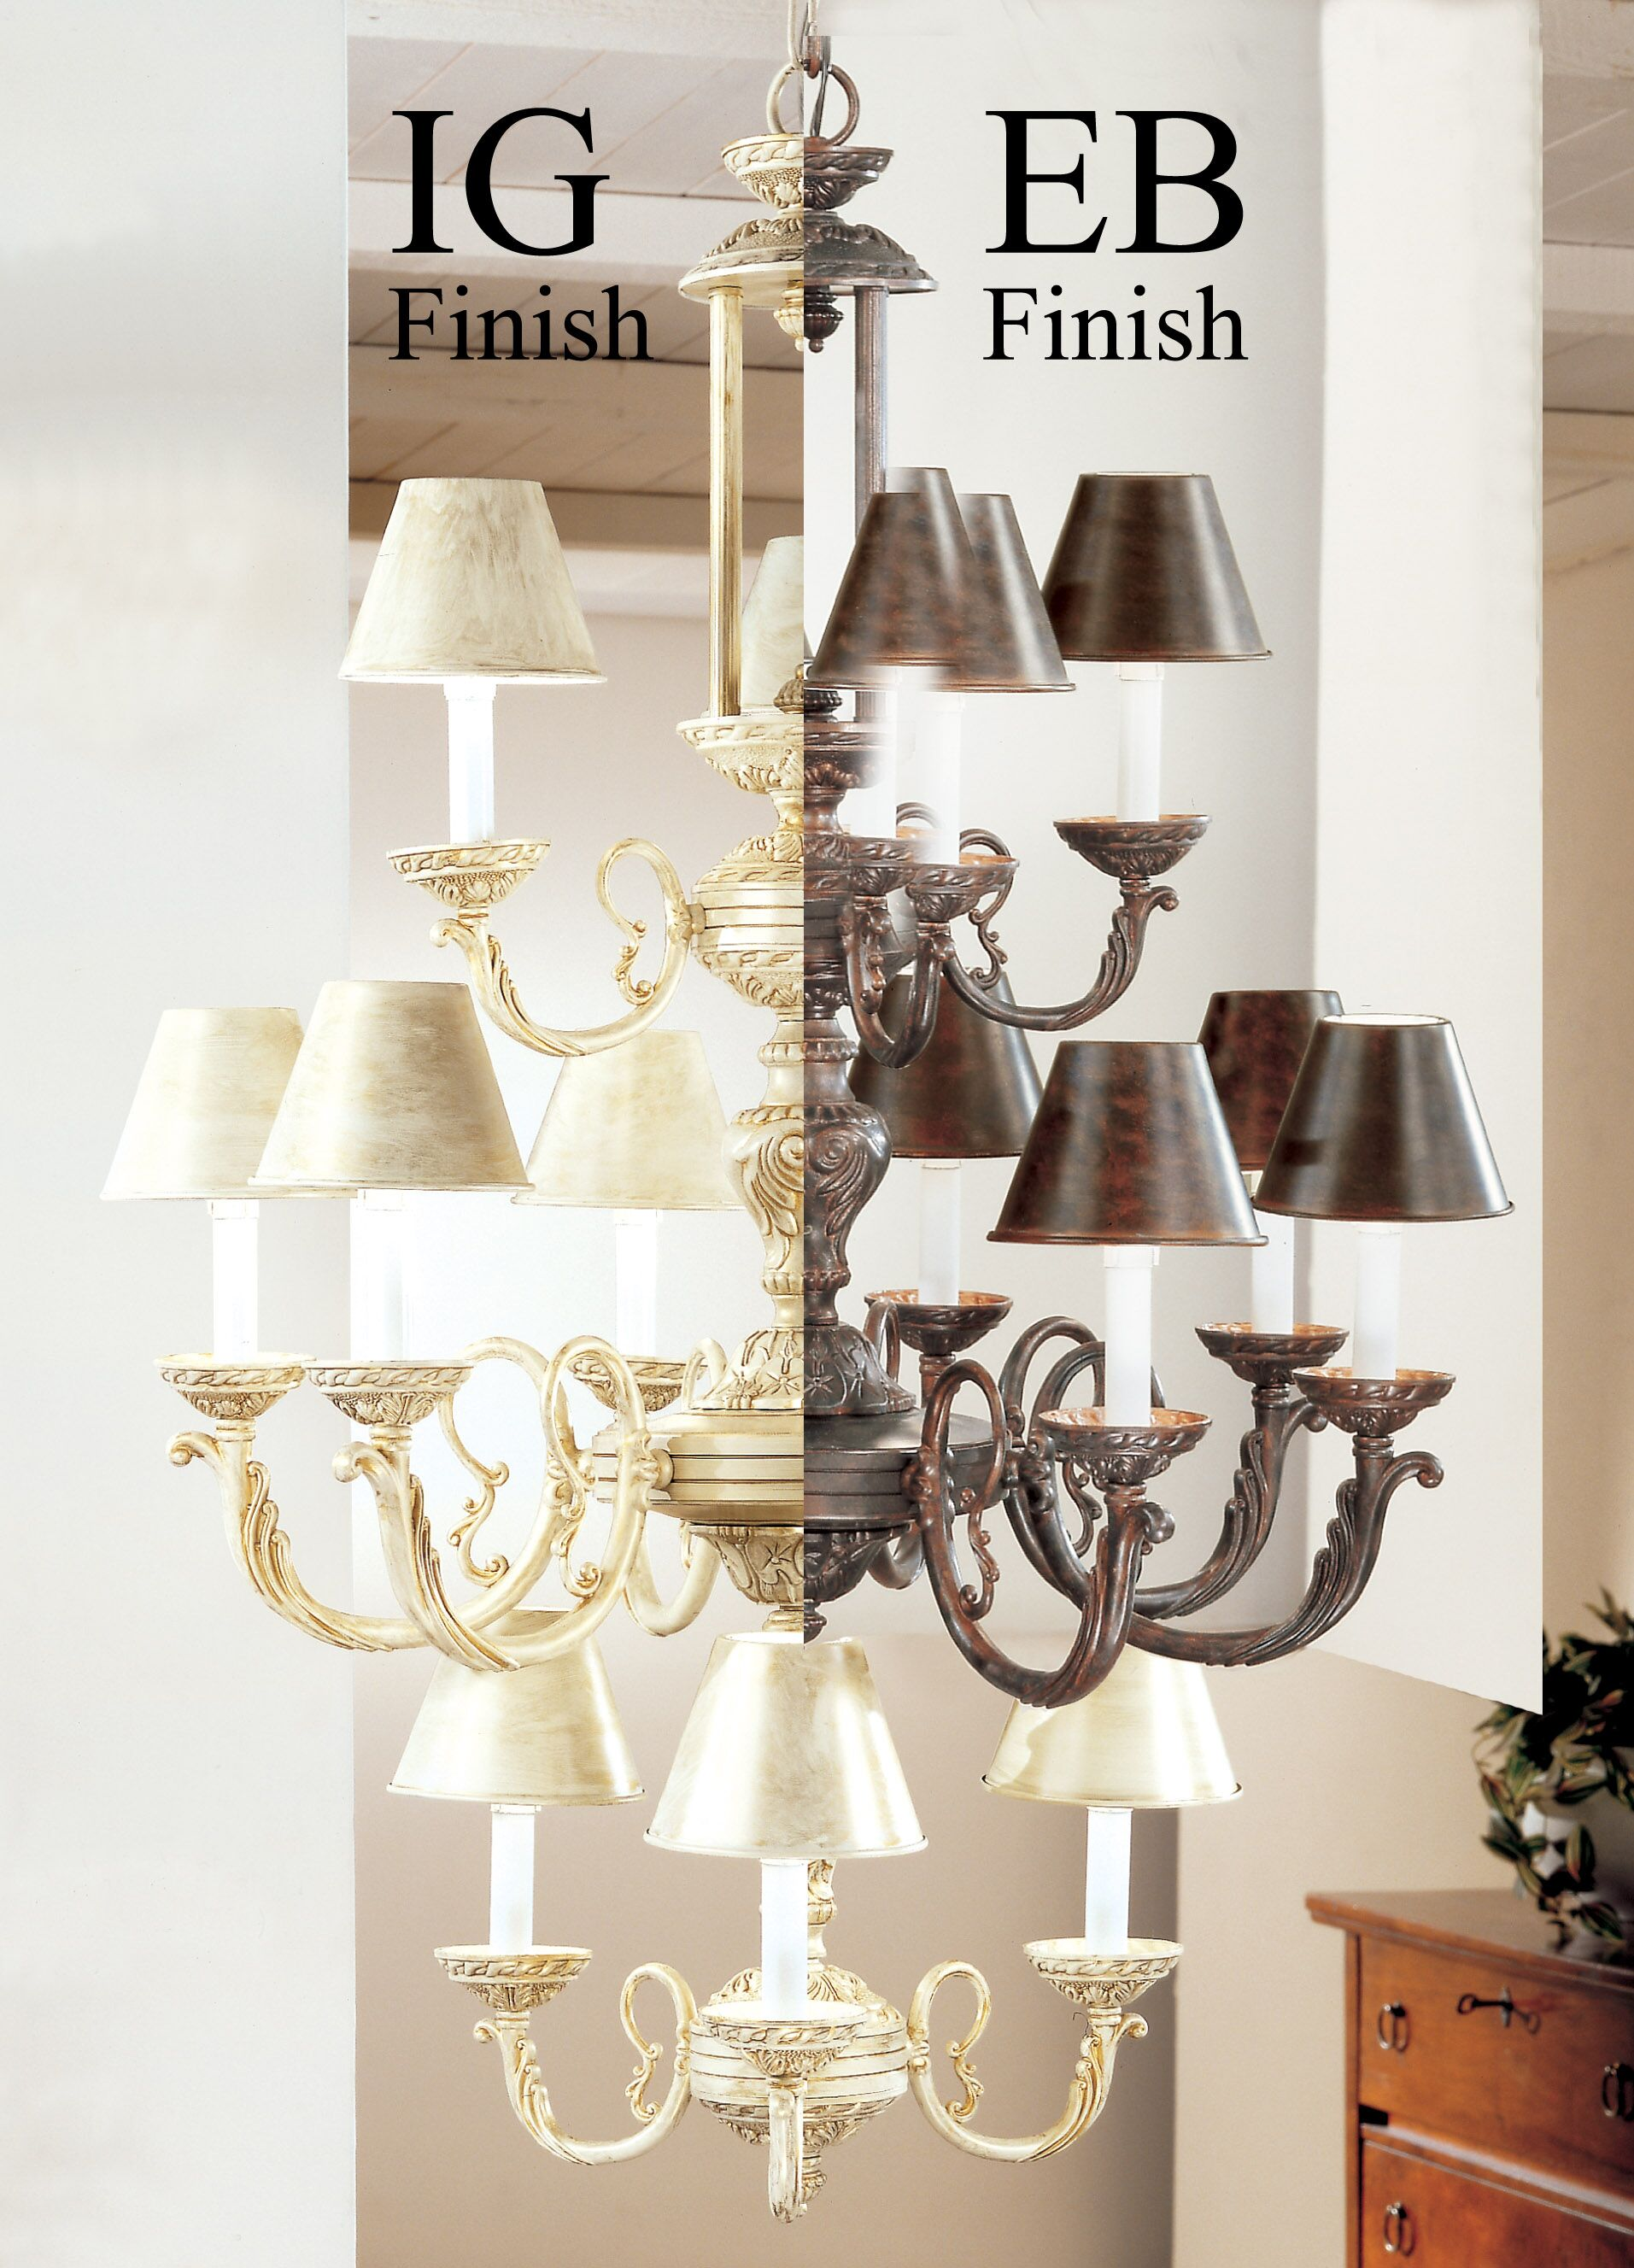 Innsbrook 12-Light Shaded Chandelier Finish: English Bronze